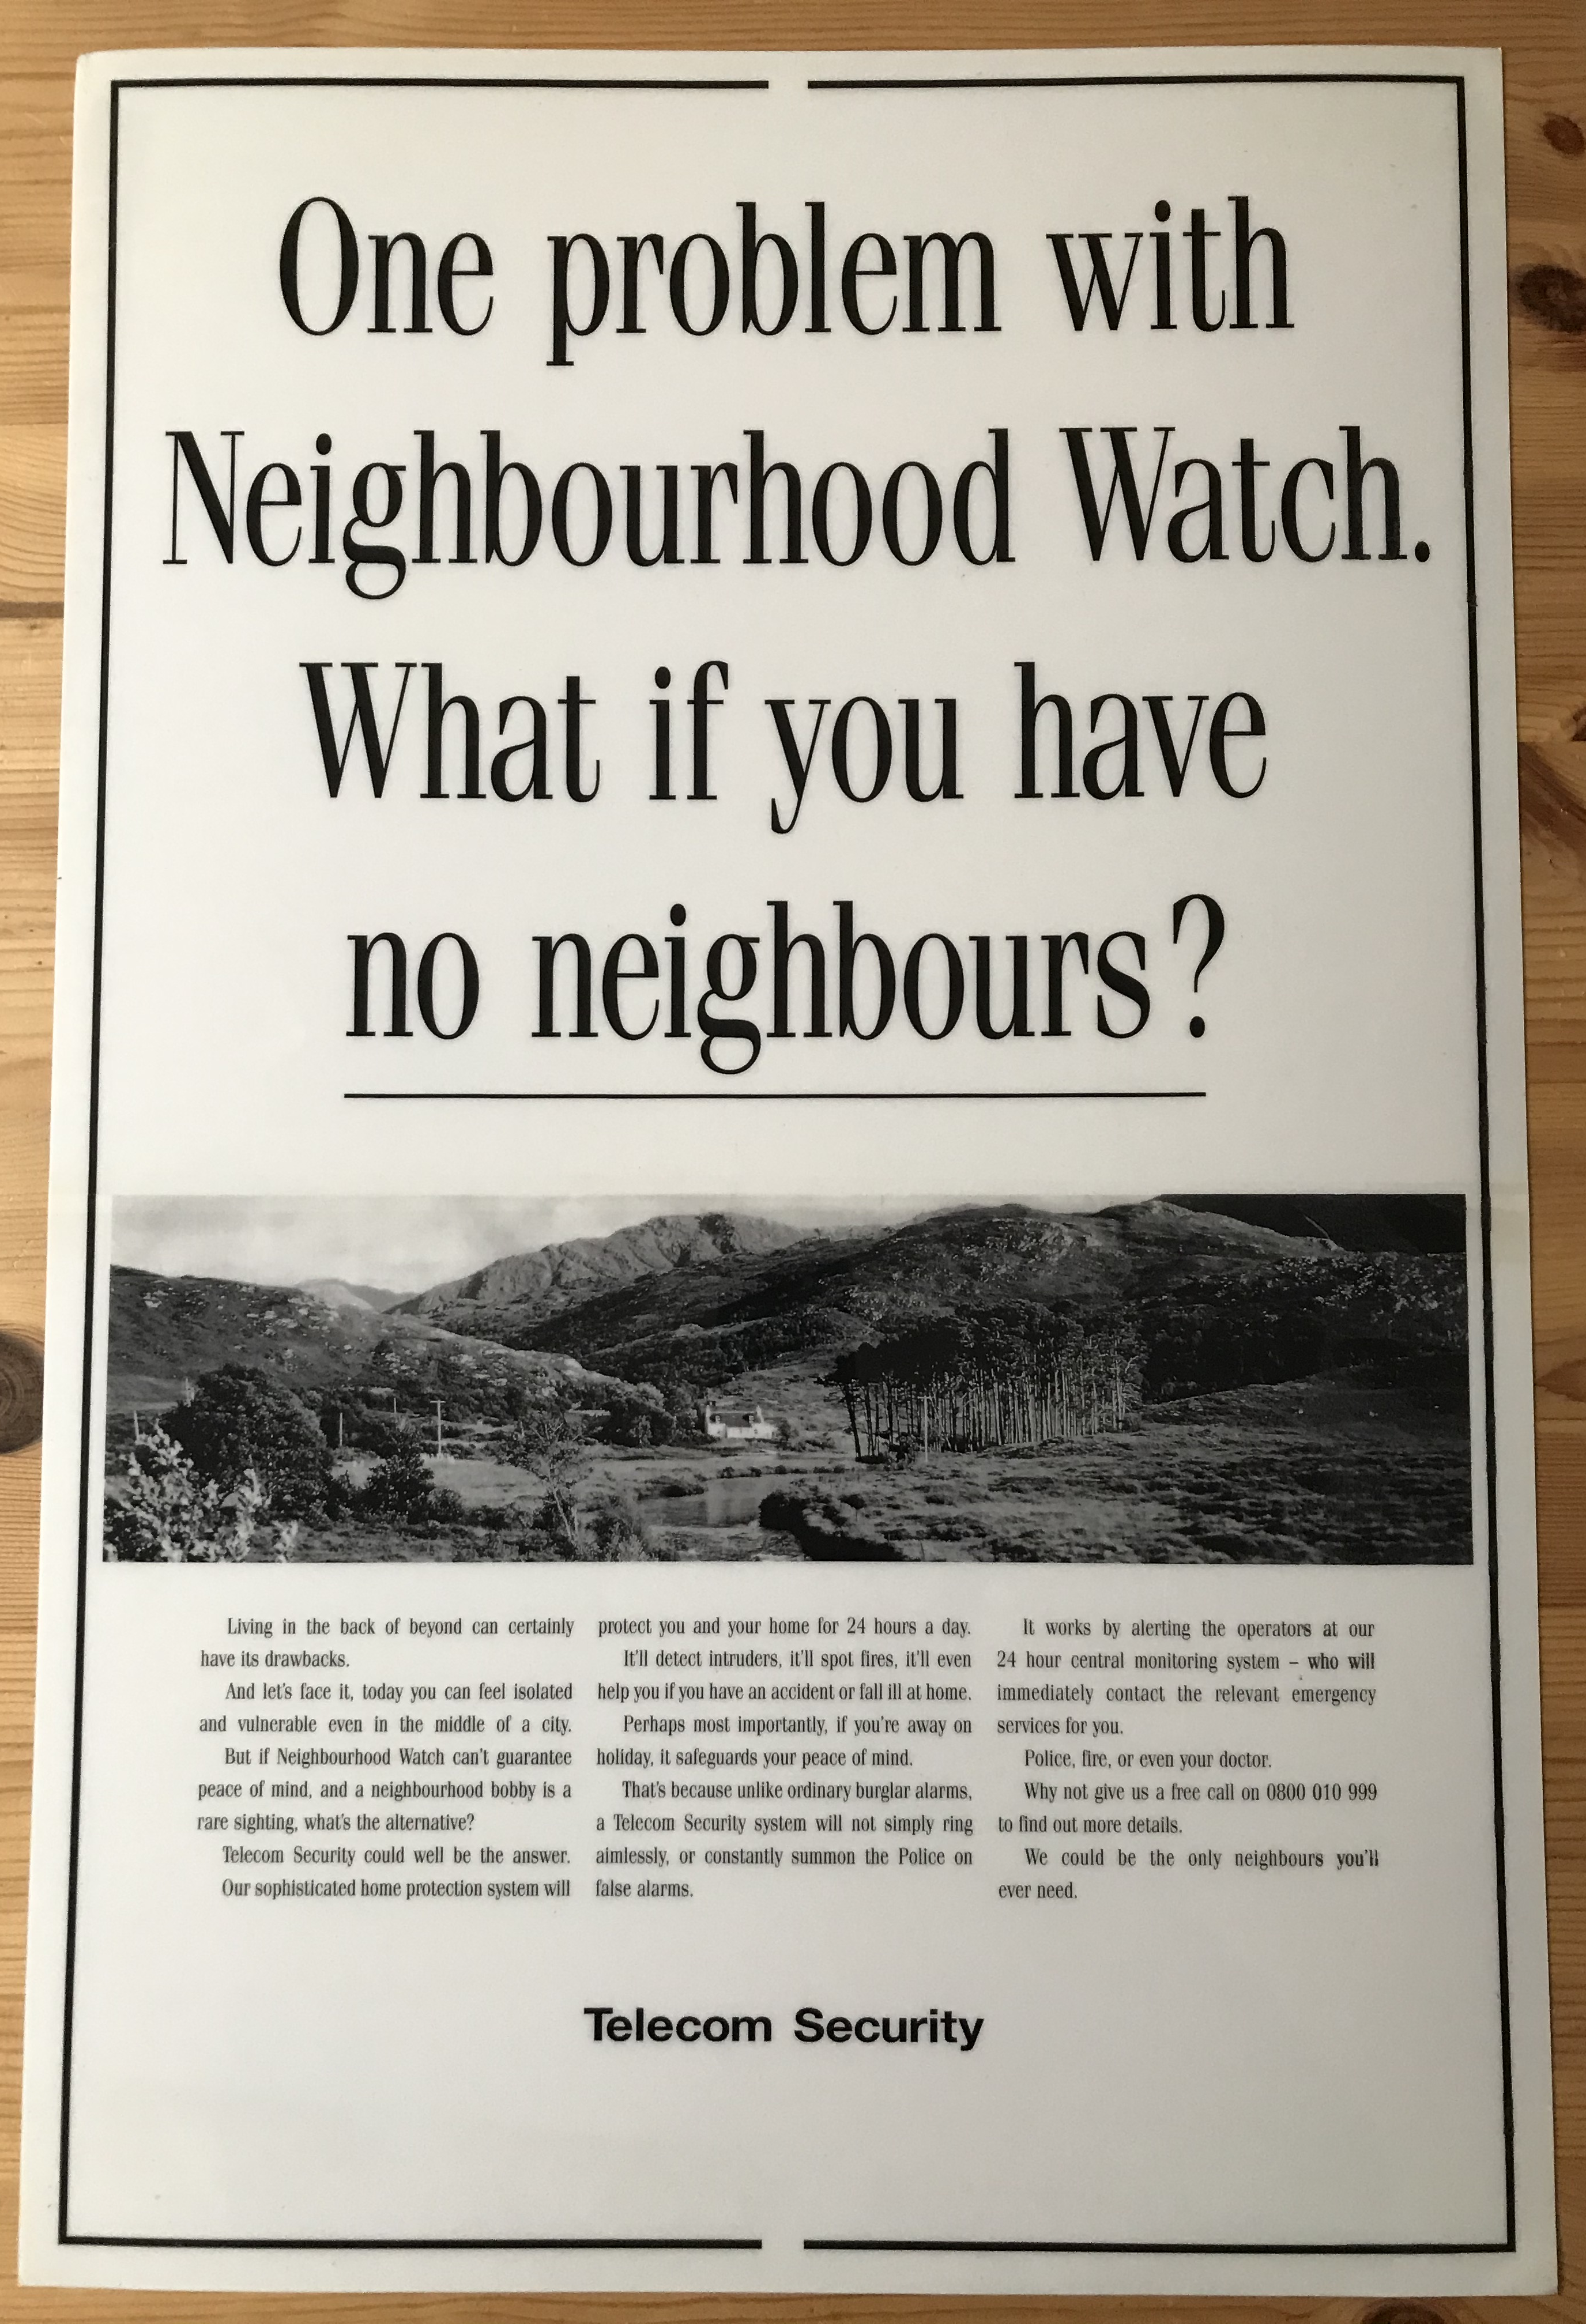 Telecom Security press ad